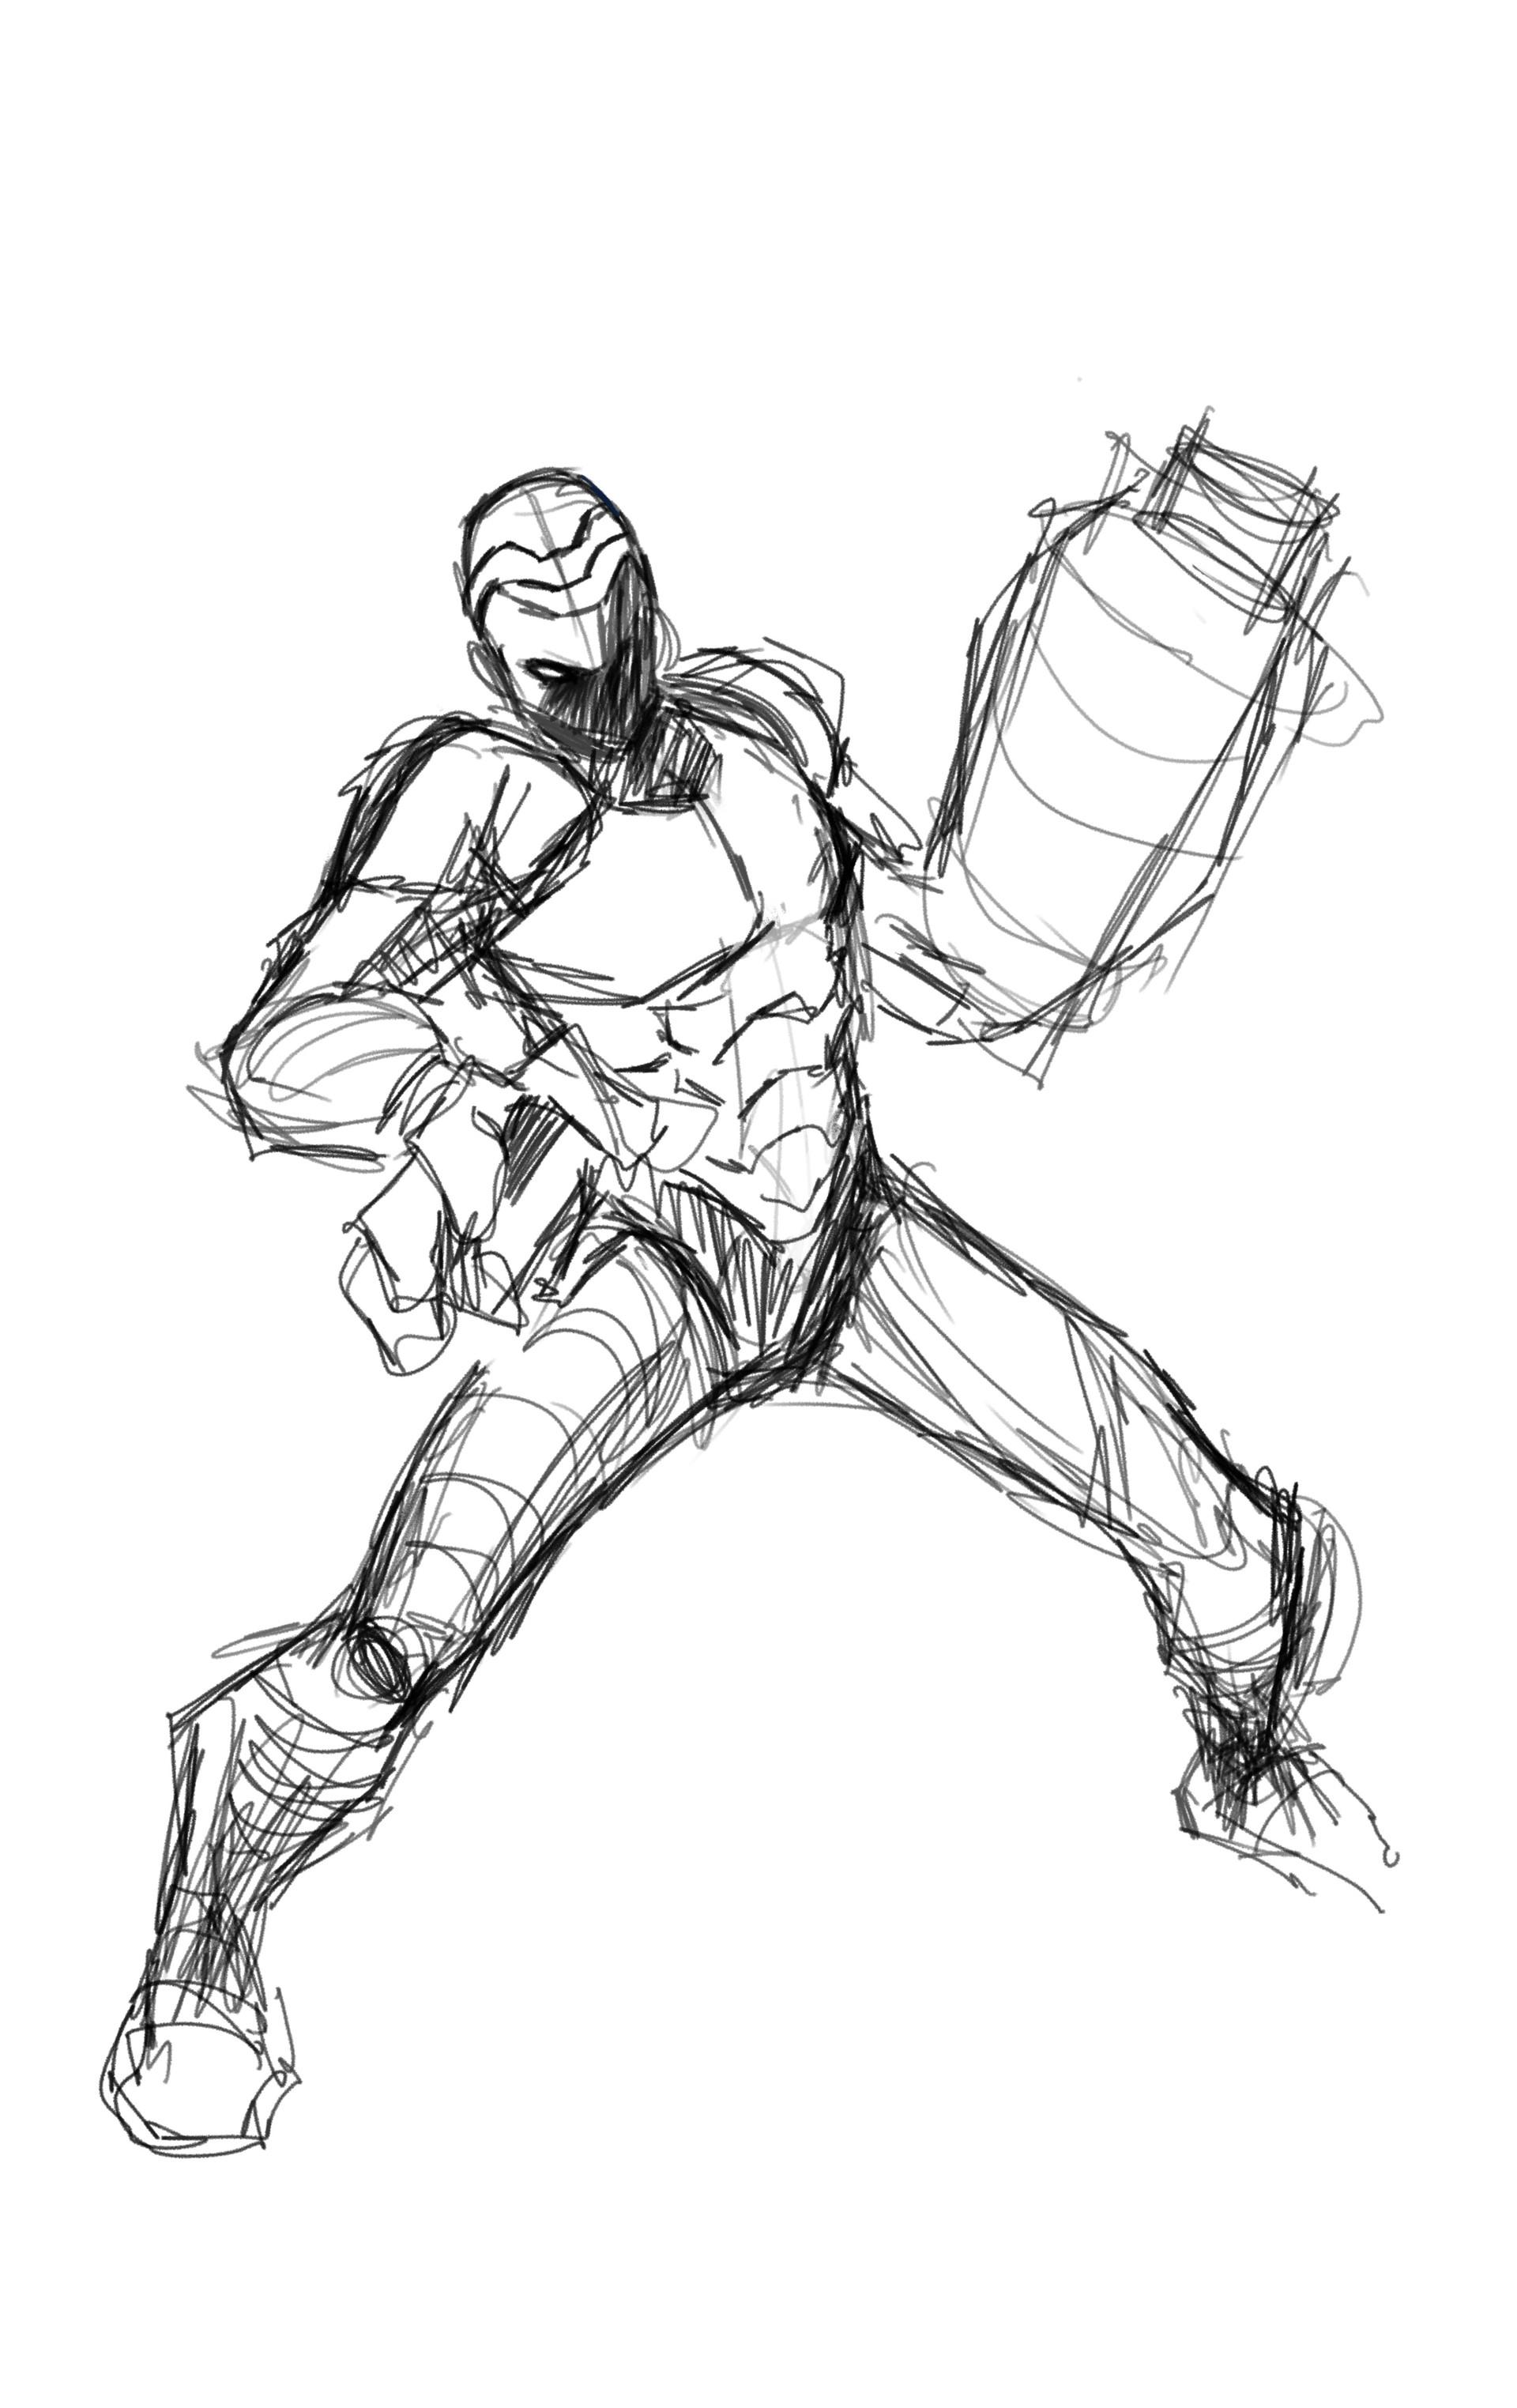 Gbenle maverick cyborg 2